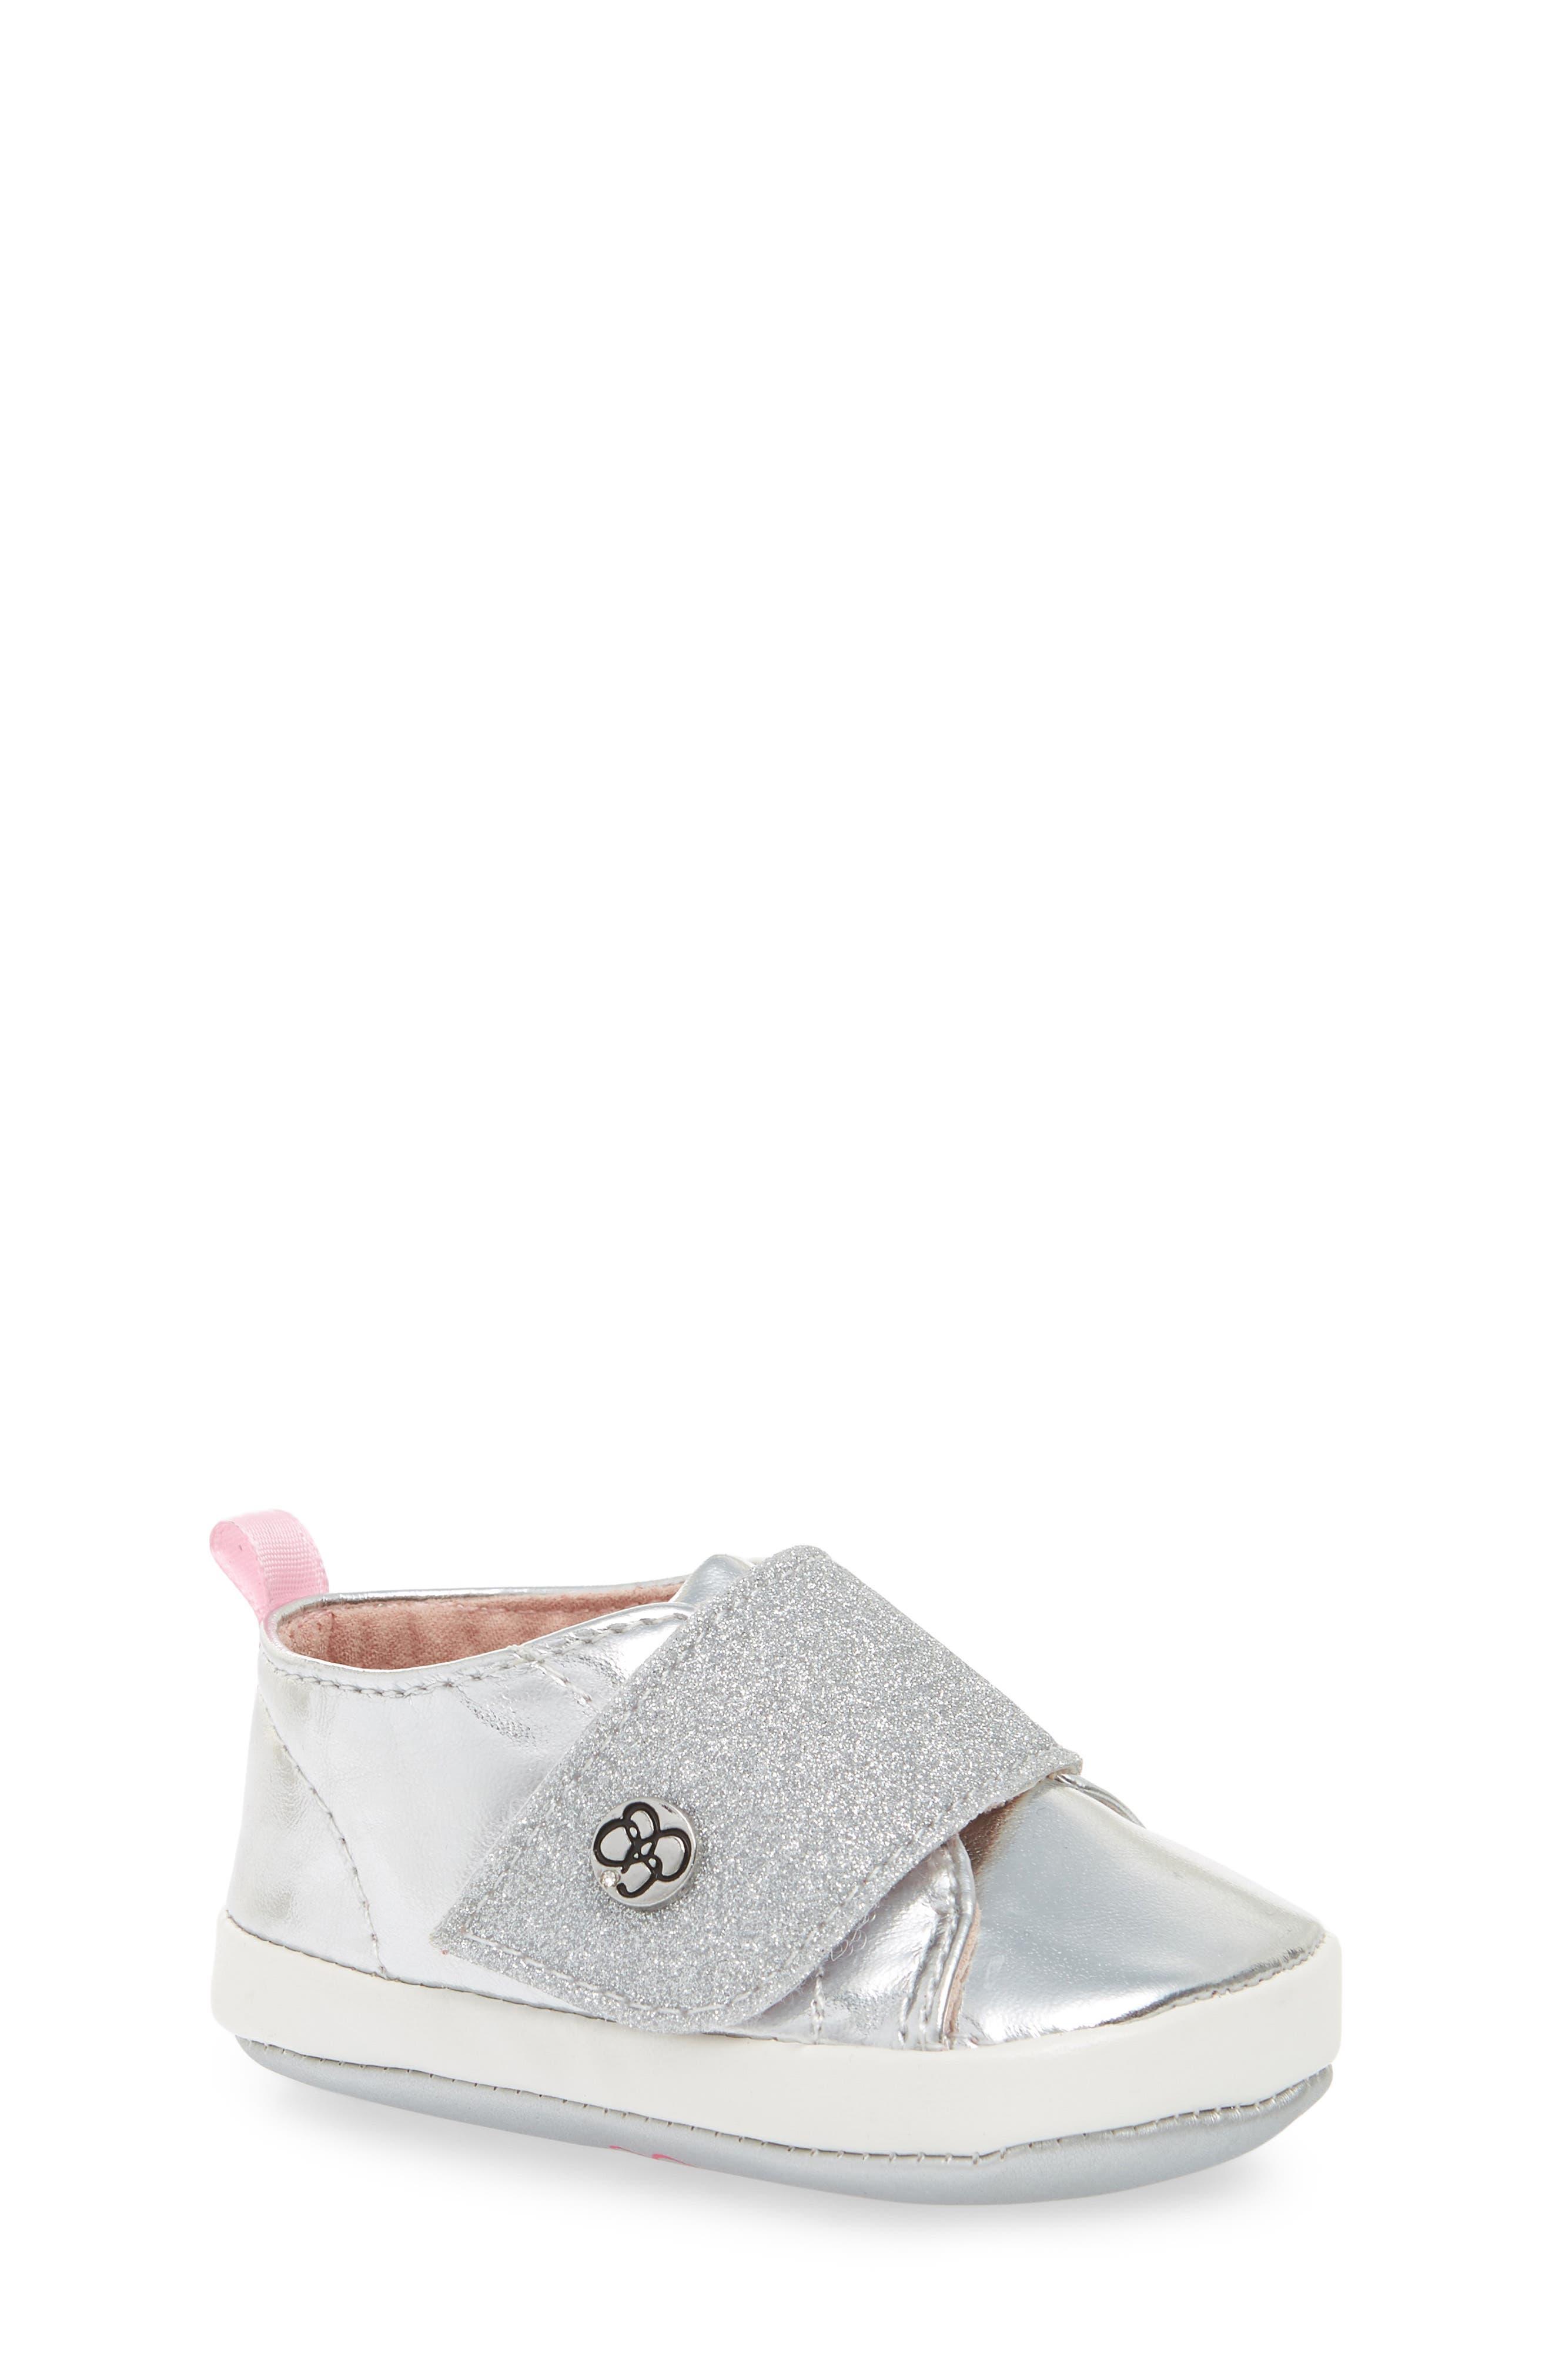 Glitter Crib Sneaker,                             Main thumbnail 1, color,                             SILVER MIRROR METALLIC